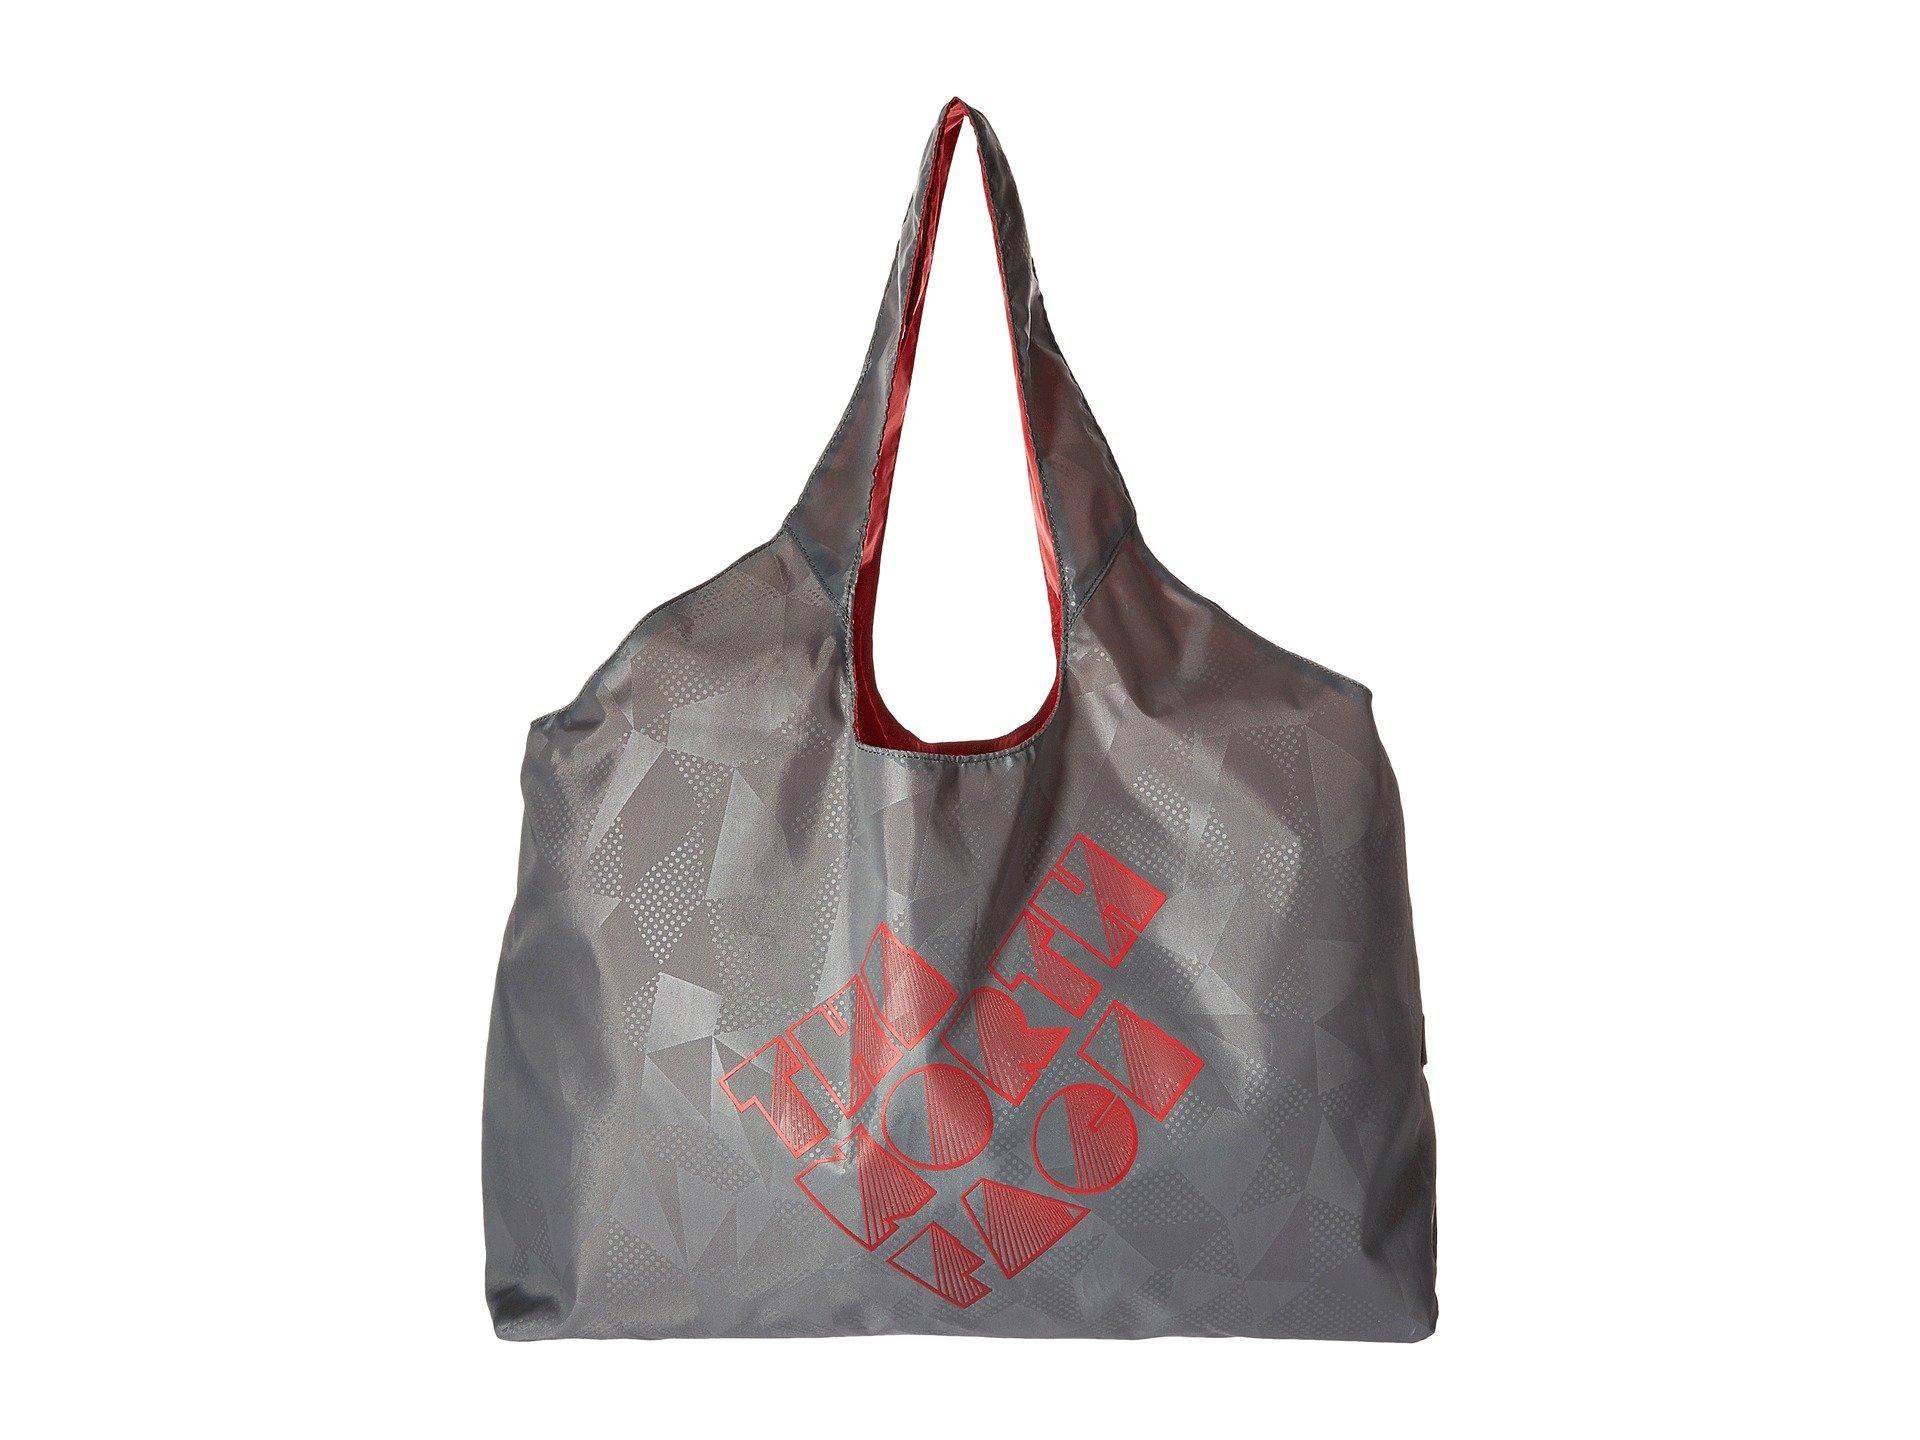 Bolso de Mano para Mujer The North Face On The Run Bag  + The North Face en VeoyCompro.net